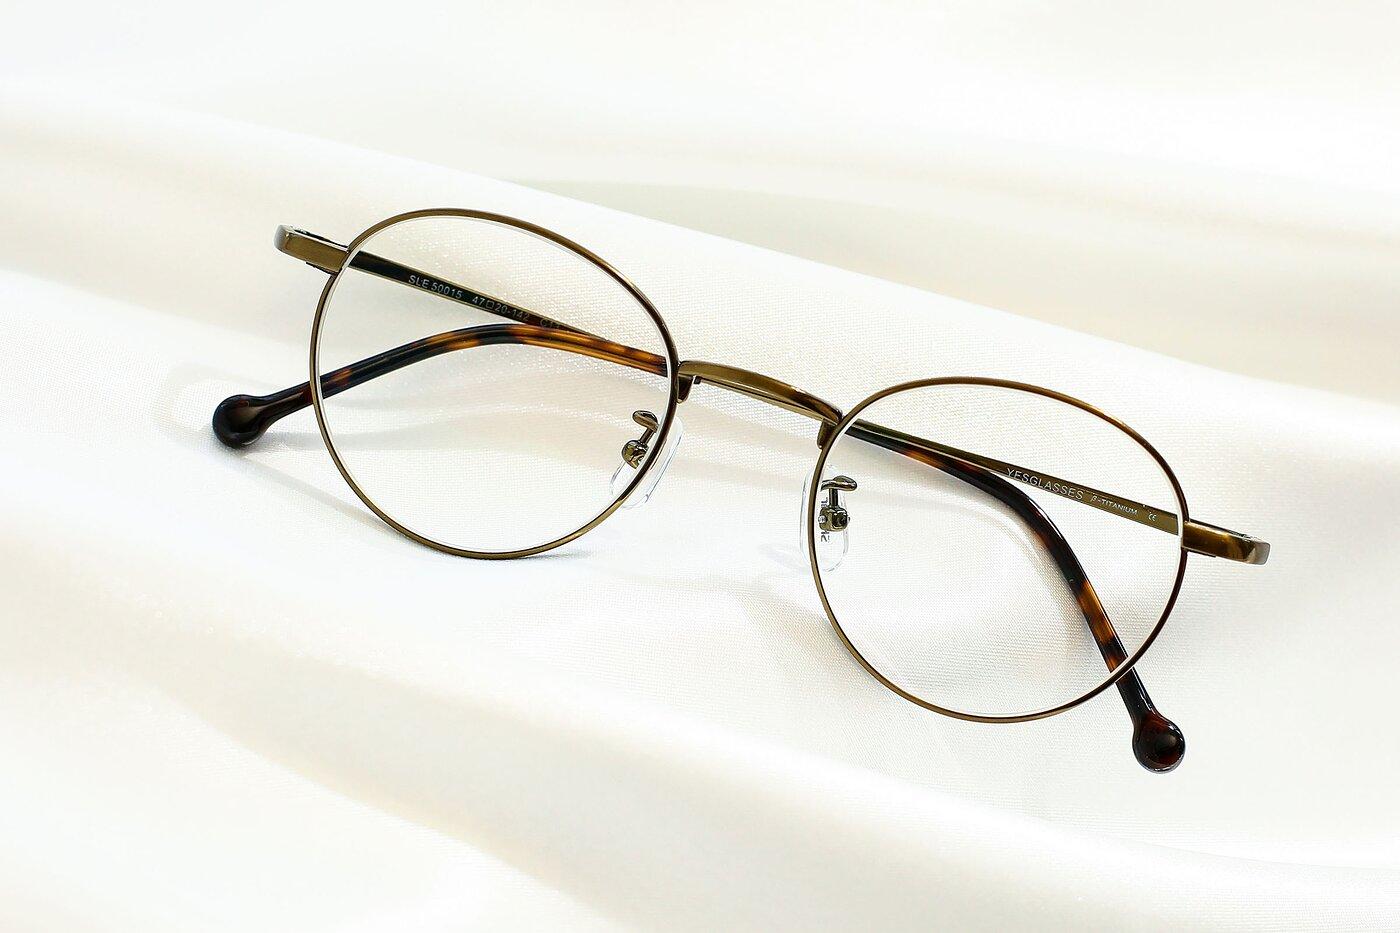 Bronze Retro-Vintage Titanium Round Eyeglasses